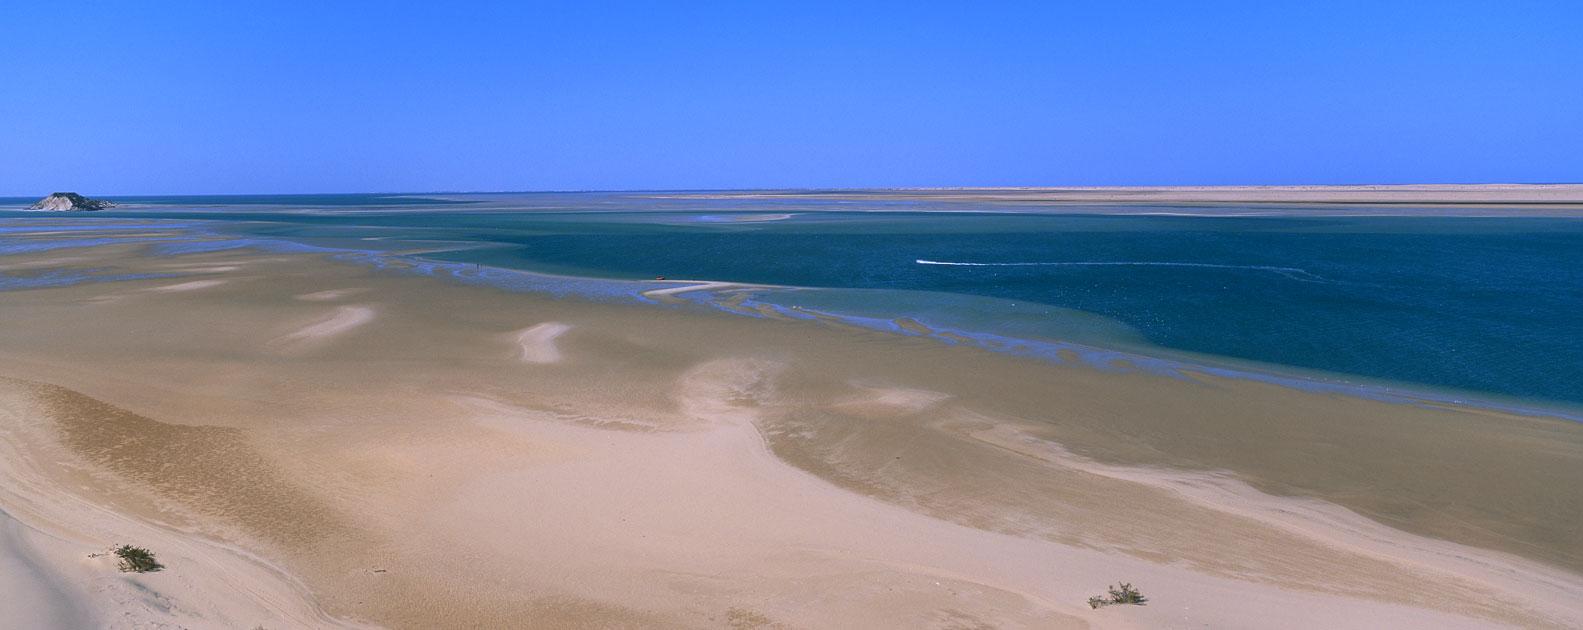 lagune de dakhla